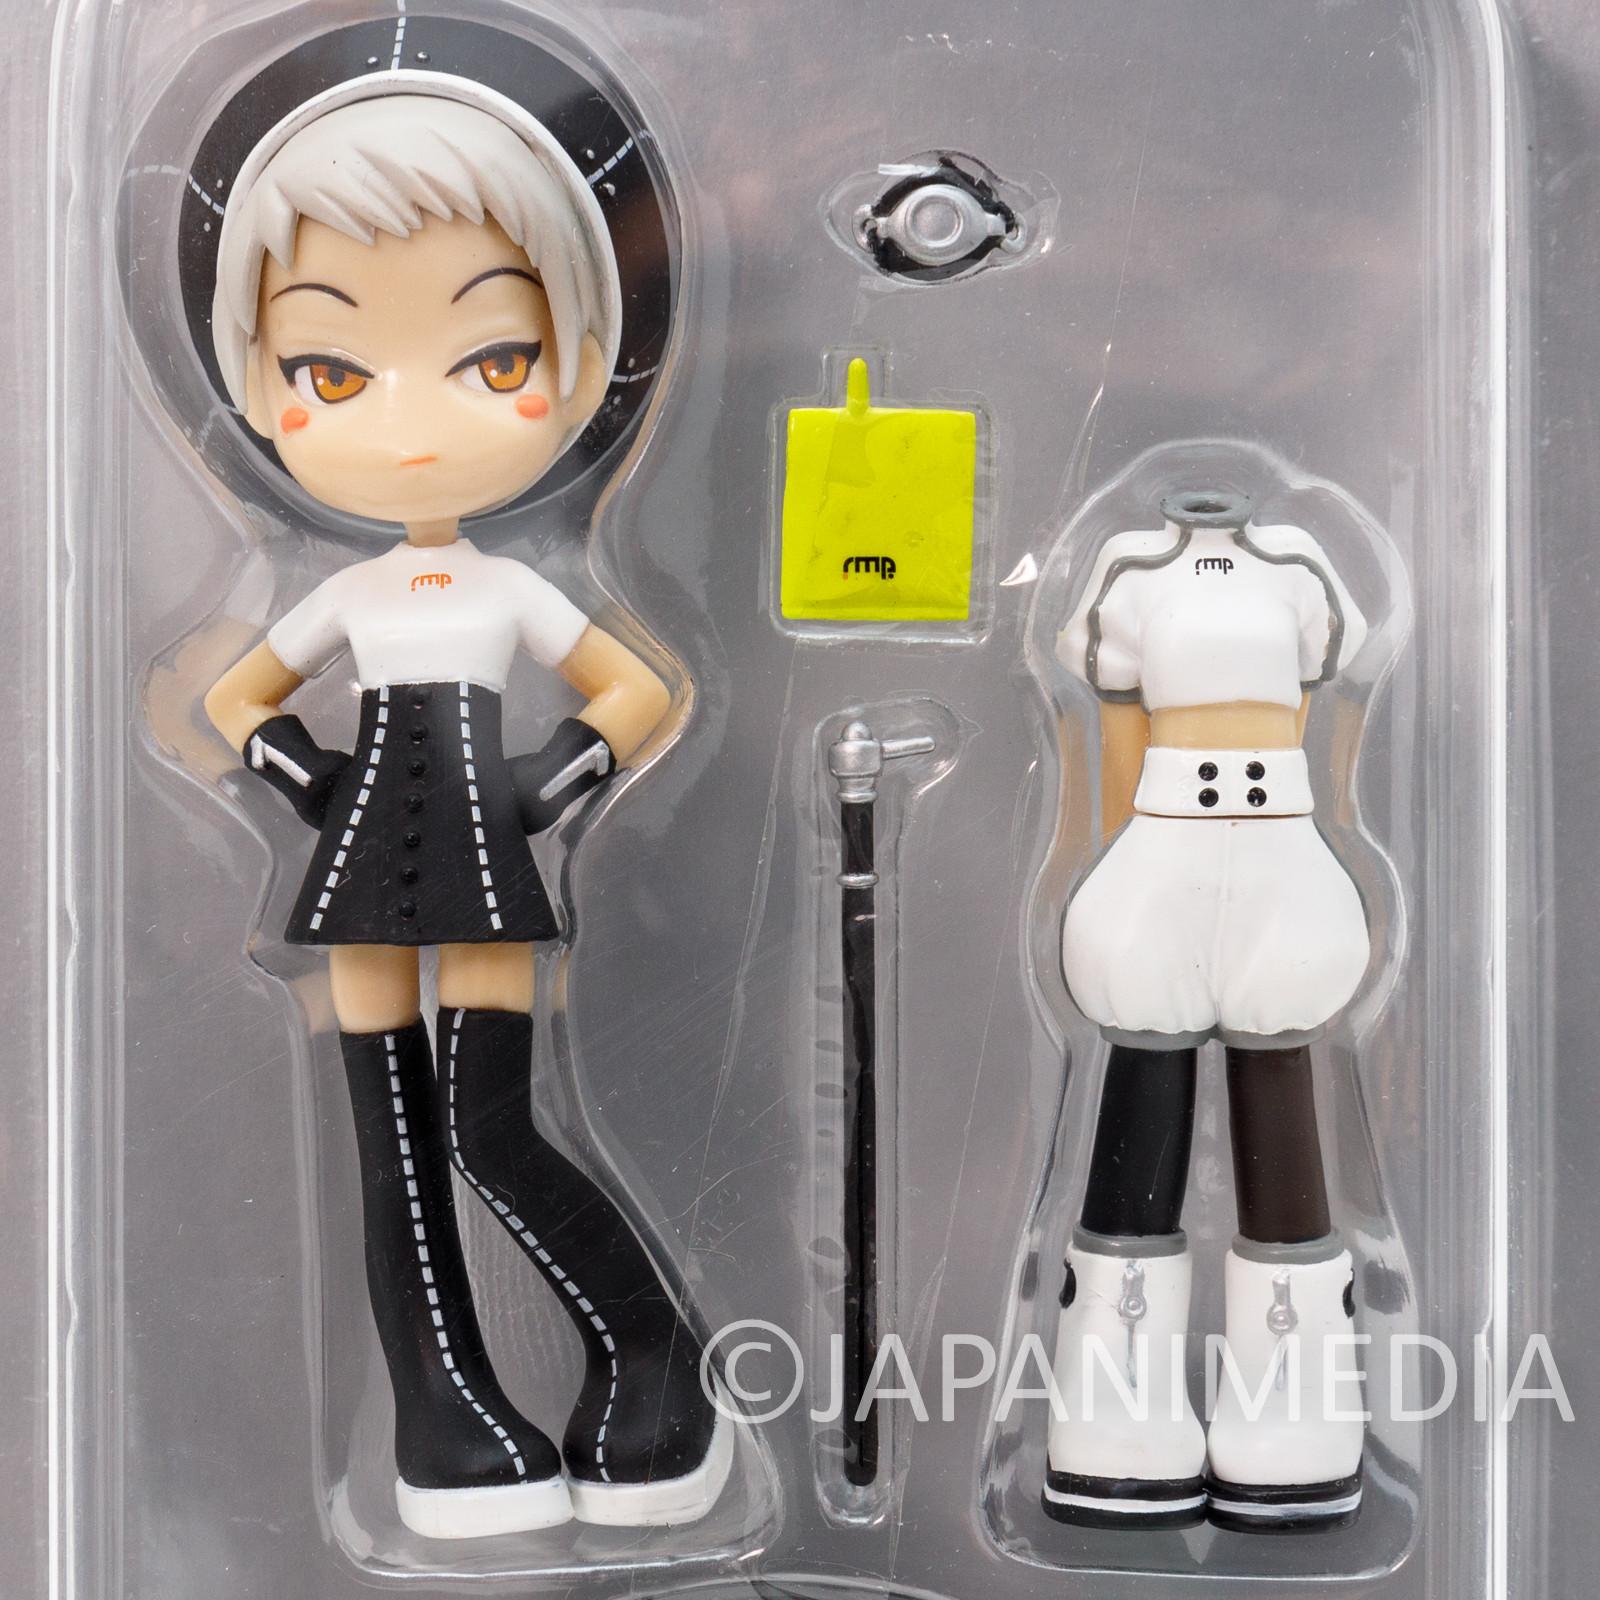 rmp003 Caine Pinky Street Figure Range Murata P:Chara JAPAN ANIME